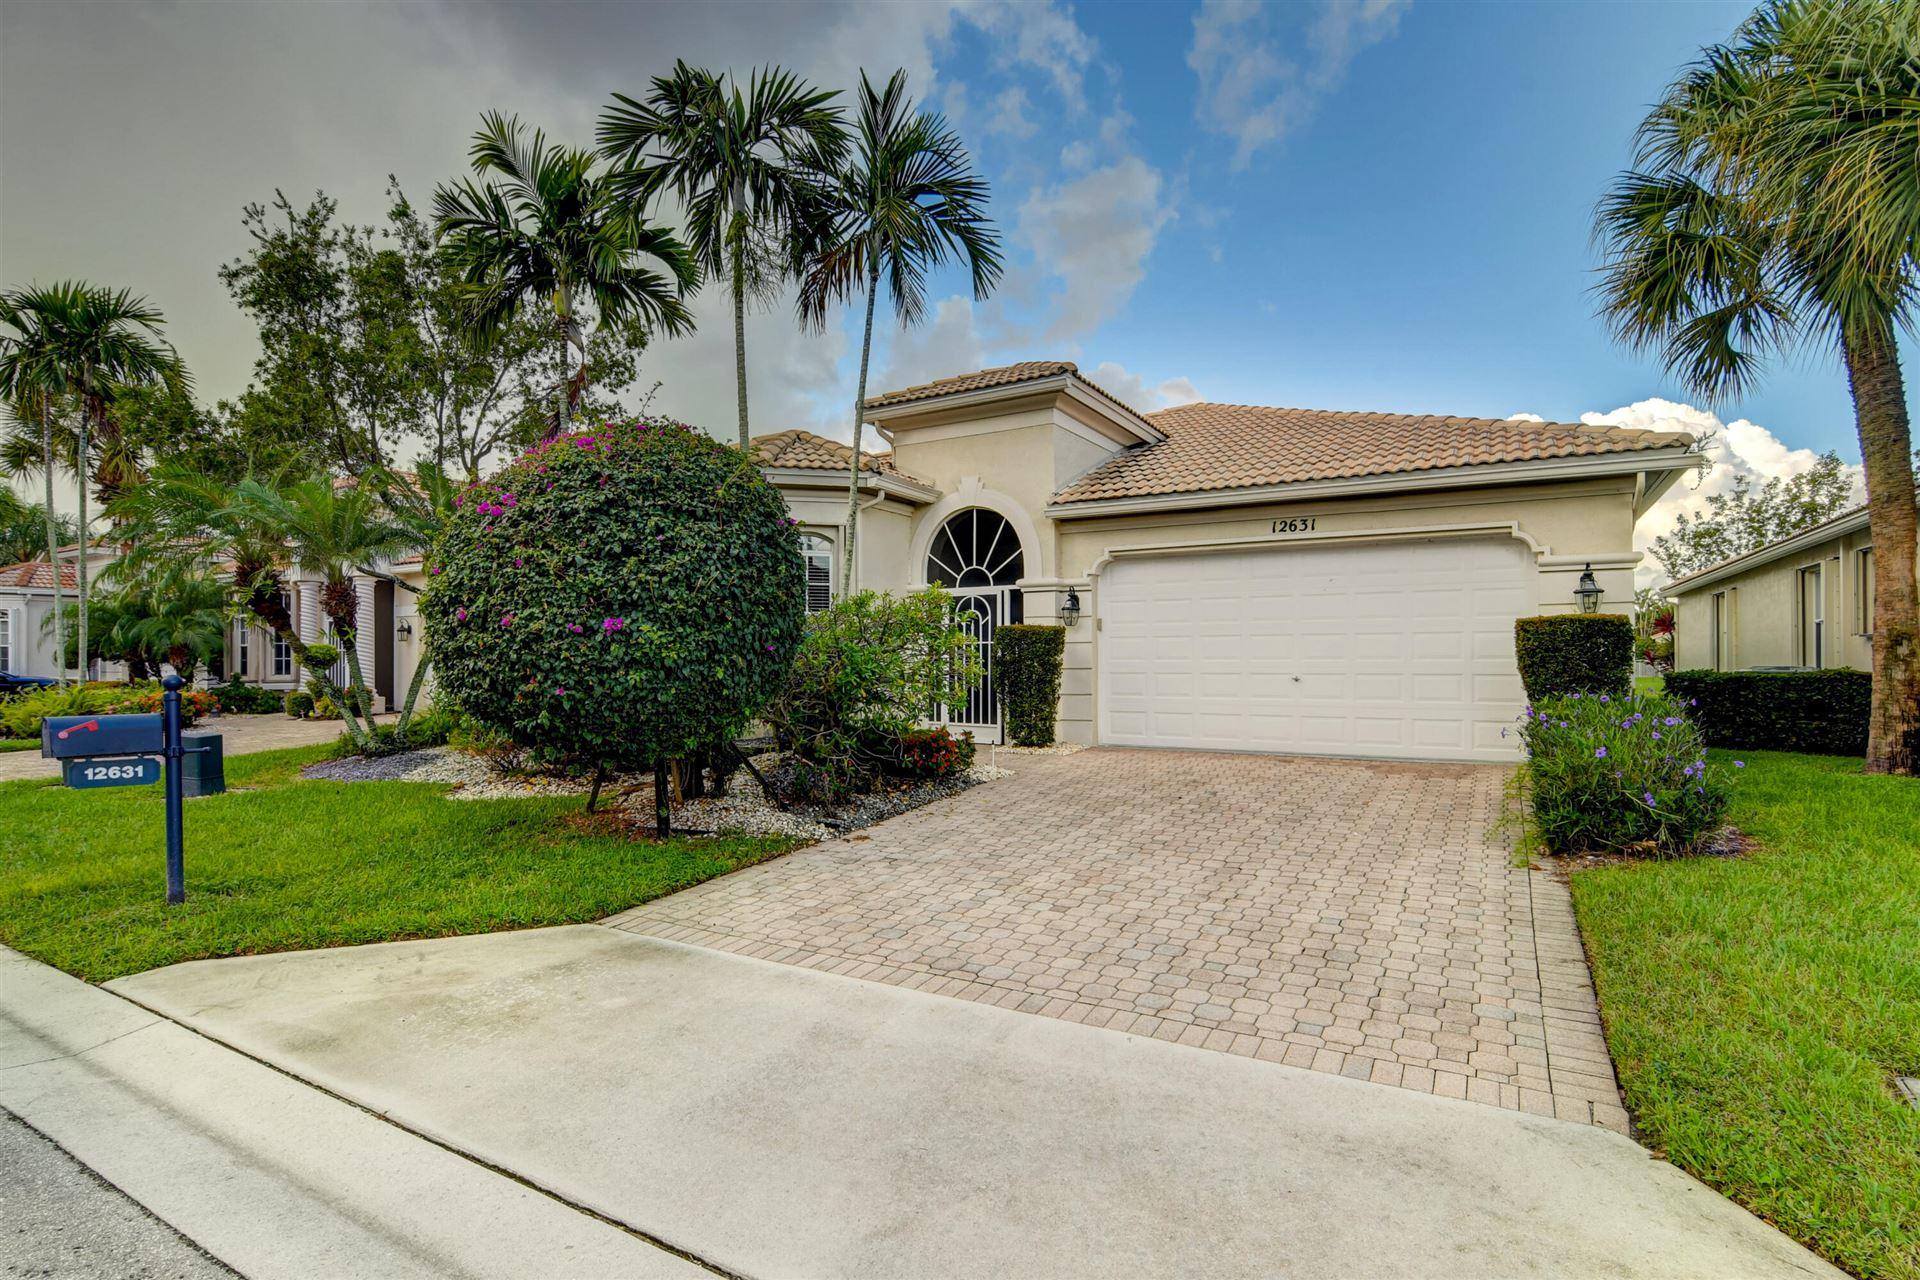 12631 Via Ravenna, Boynton Beach, FL 33436 - #: RX-10751850